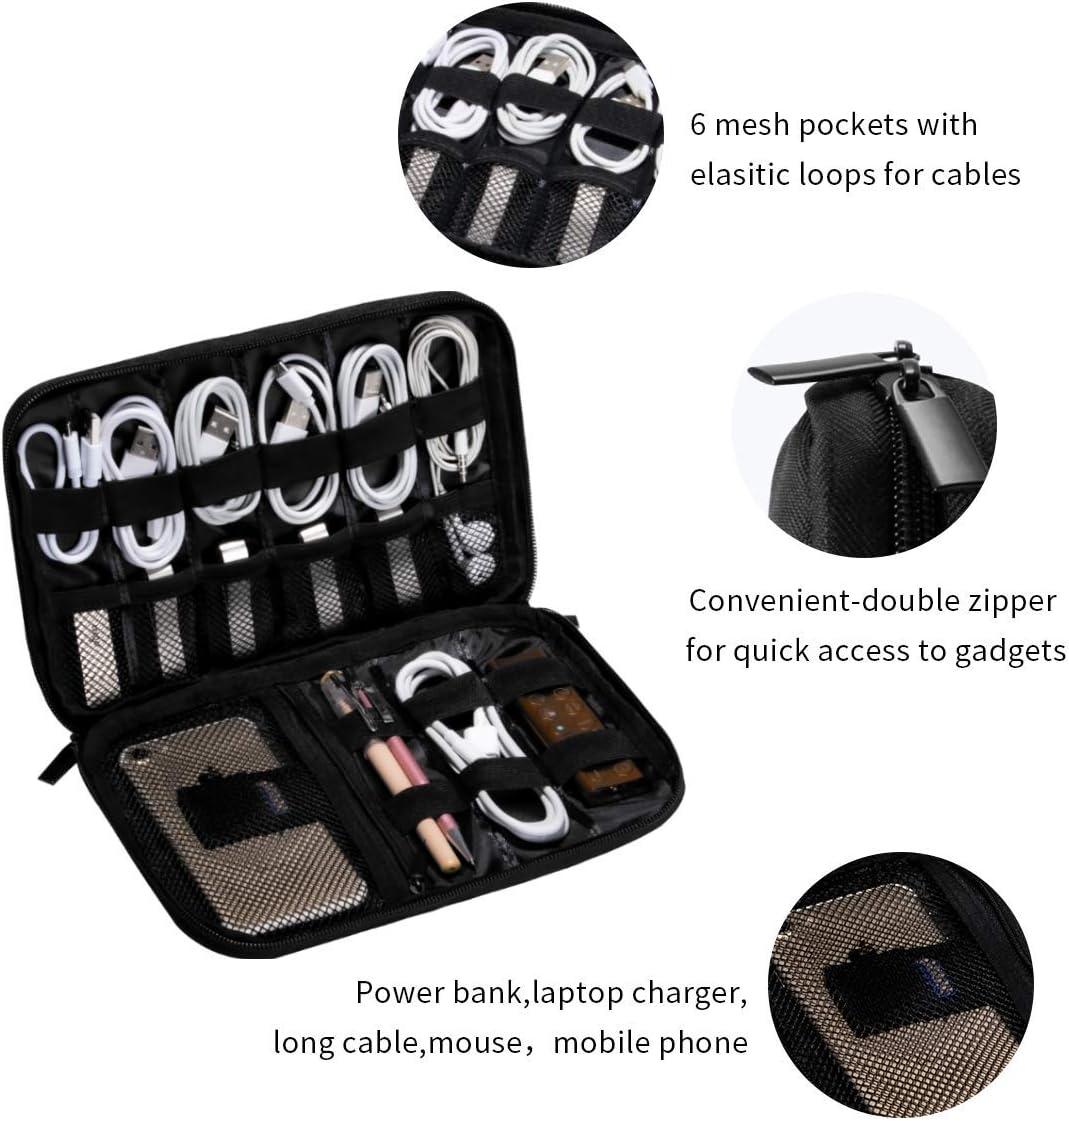 RUIANSHISHENGYOUDA Heartbeat Multi-Function Data Line Storage Bag Electronics Accessories USB Cable Packet Portable